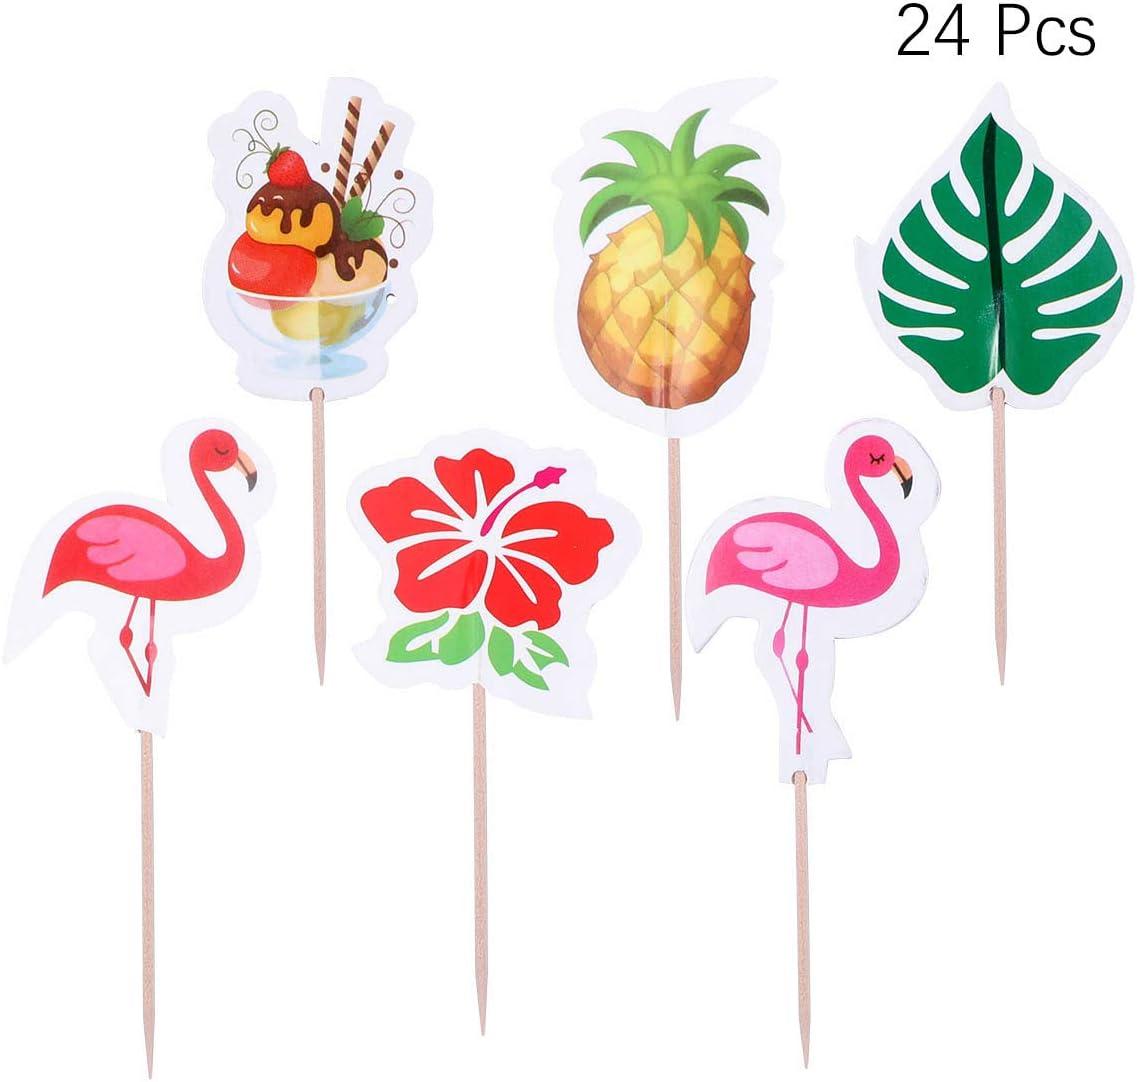 Amosfun Flamingo Ananas Cupcake Topper Picks Papier /À Bricolage Tropical Cake Toppers Mignon Cr/ème Glac/ée Fruits Dessert Pics pour Hawaii Summer Party 72 PCS